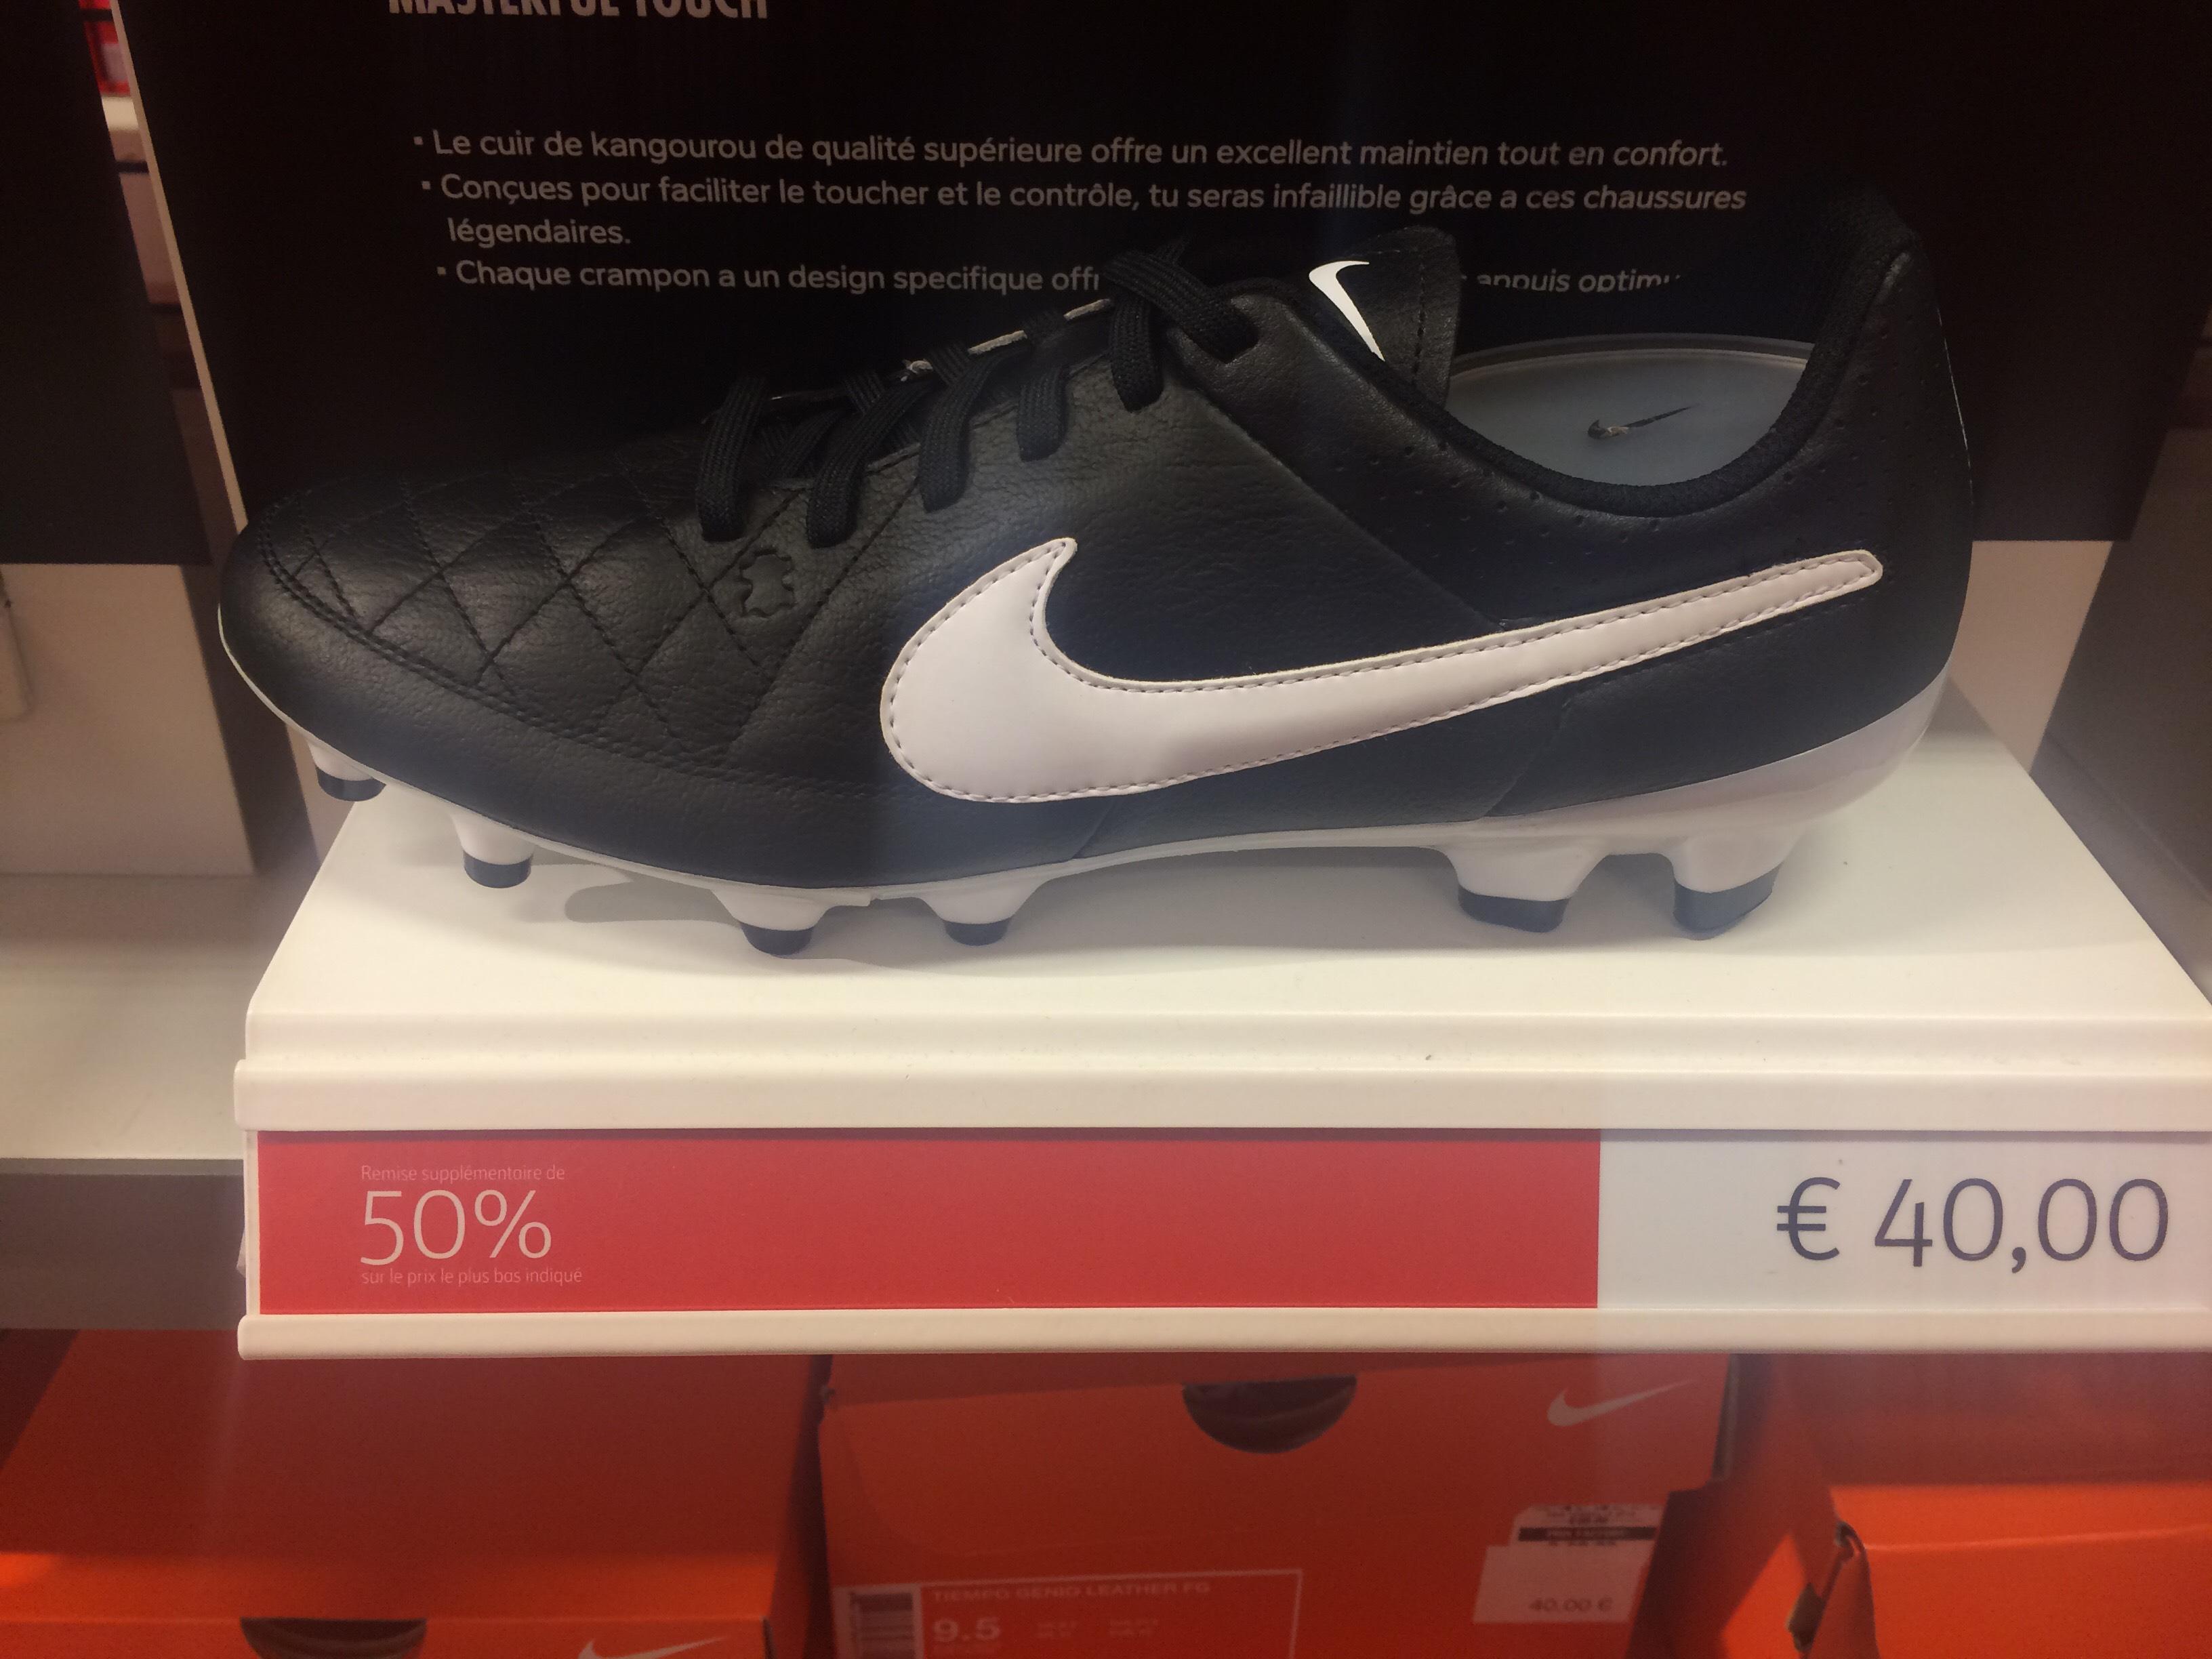 Chaussures foot Nike Tiempo - Plusieurs modèles